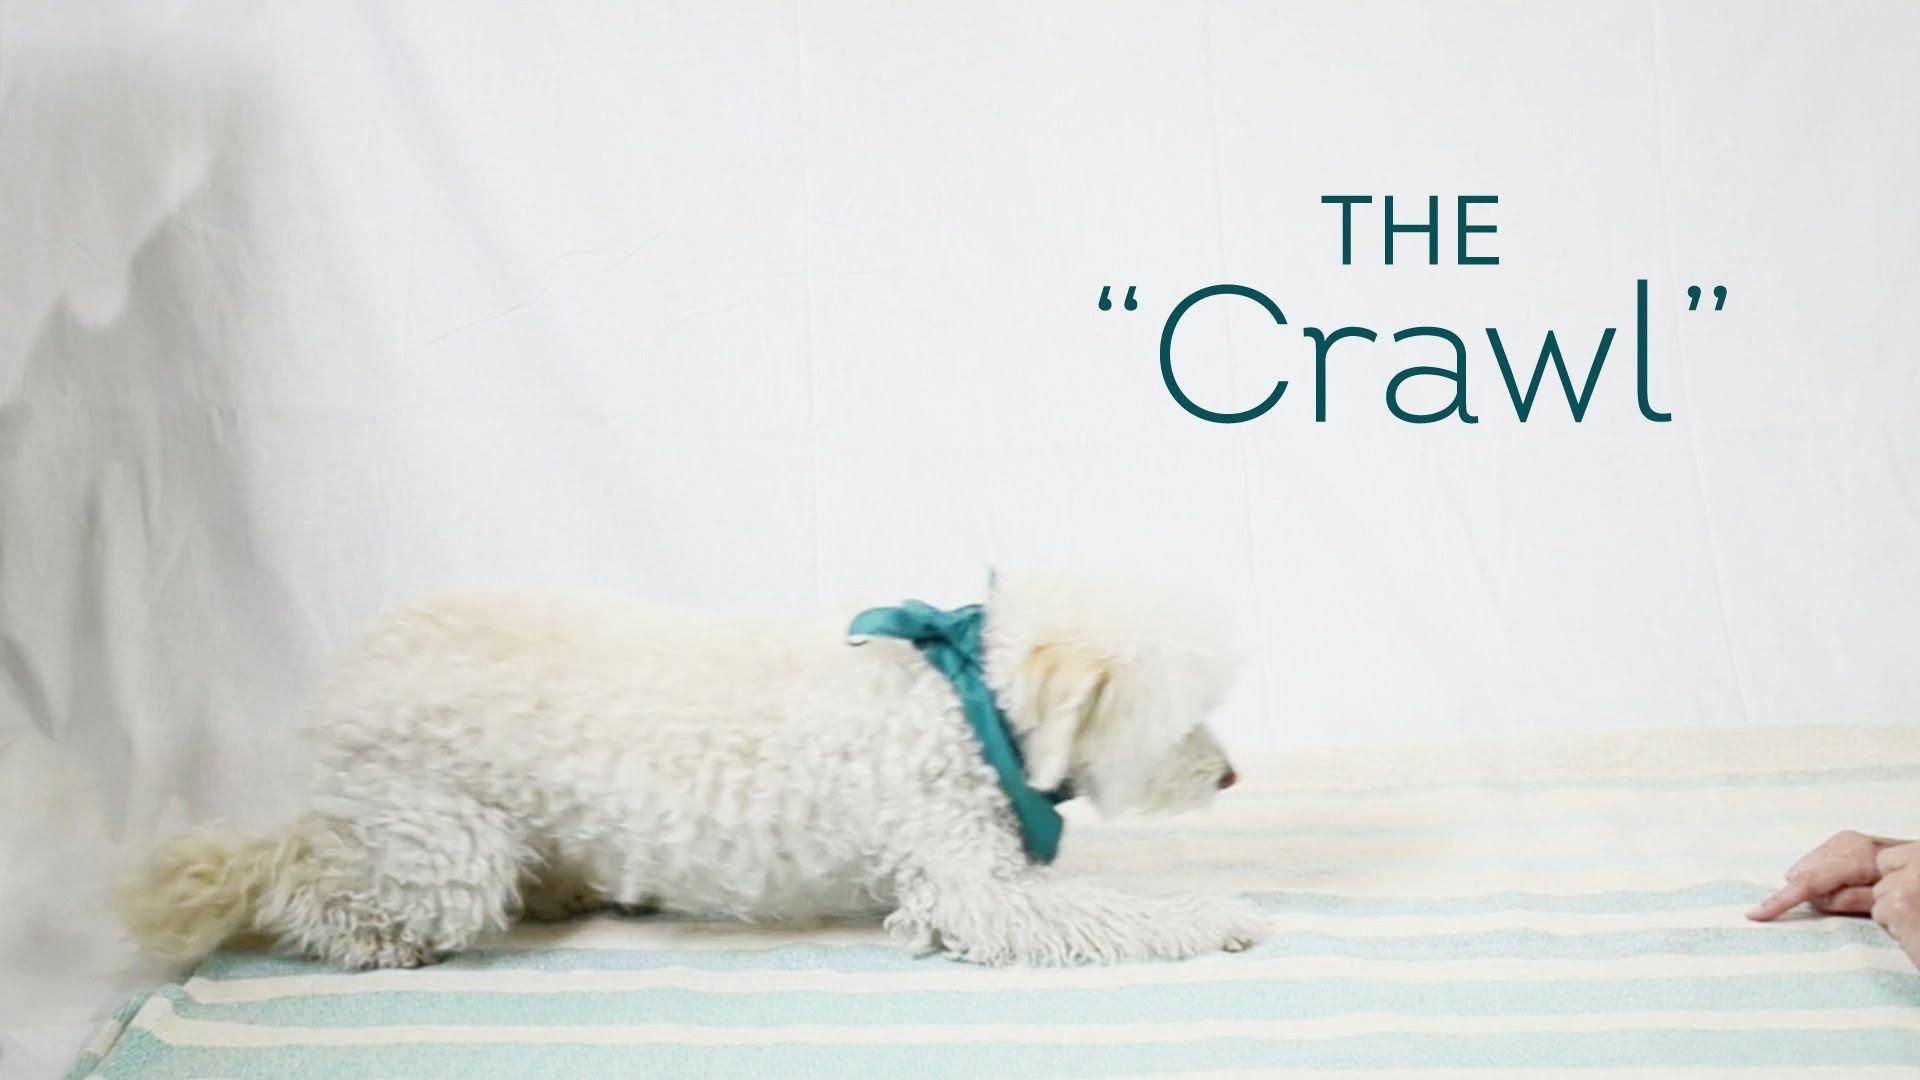 Once your dog has mastered basics like sit shake and lie